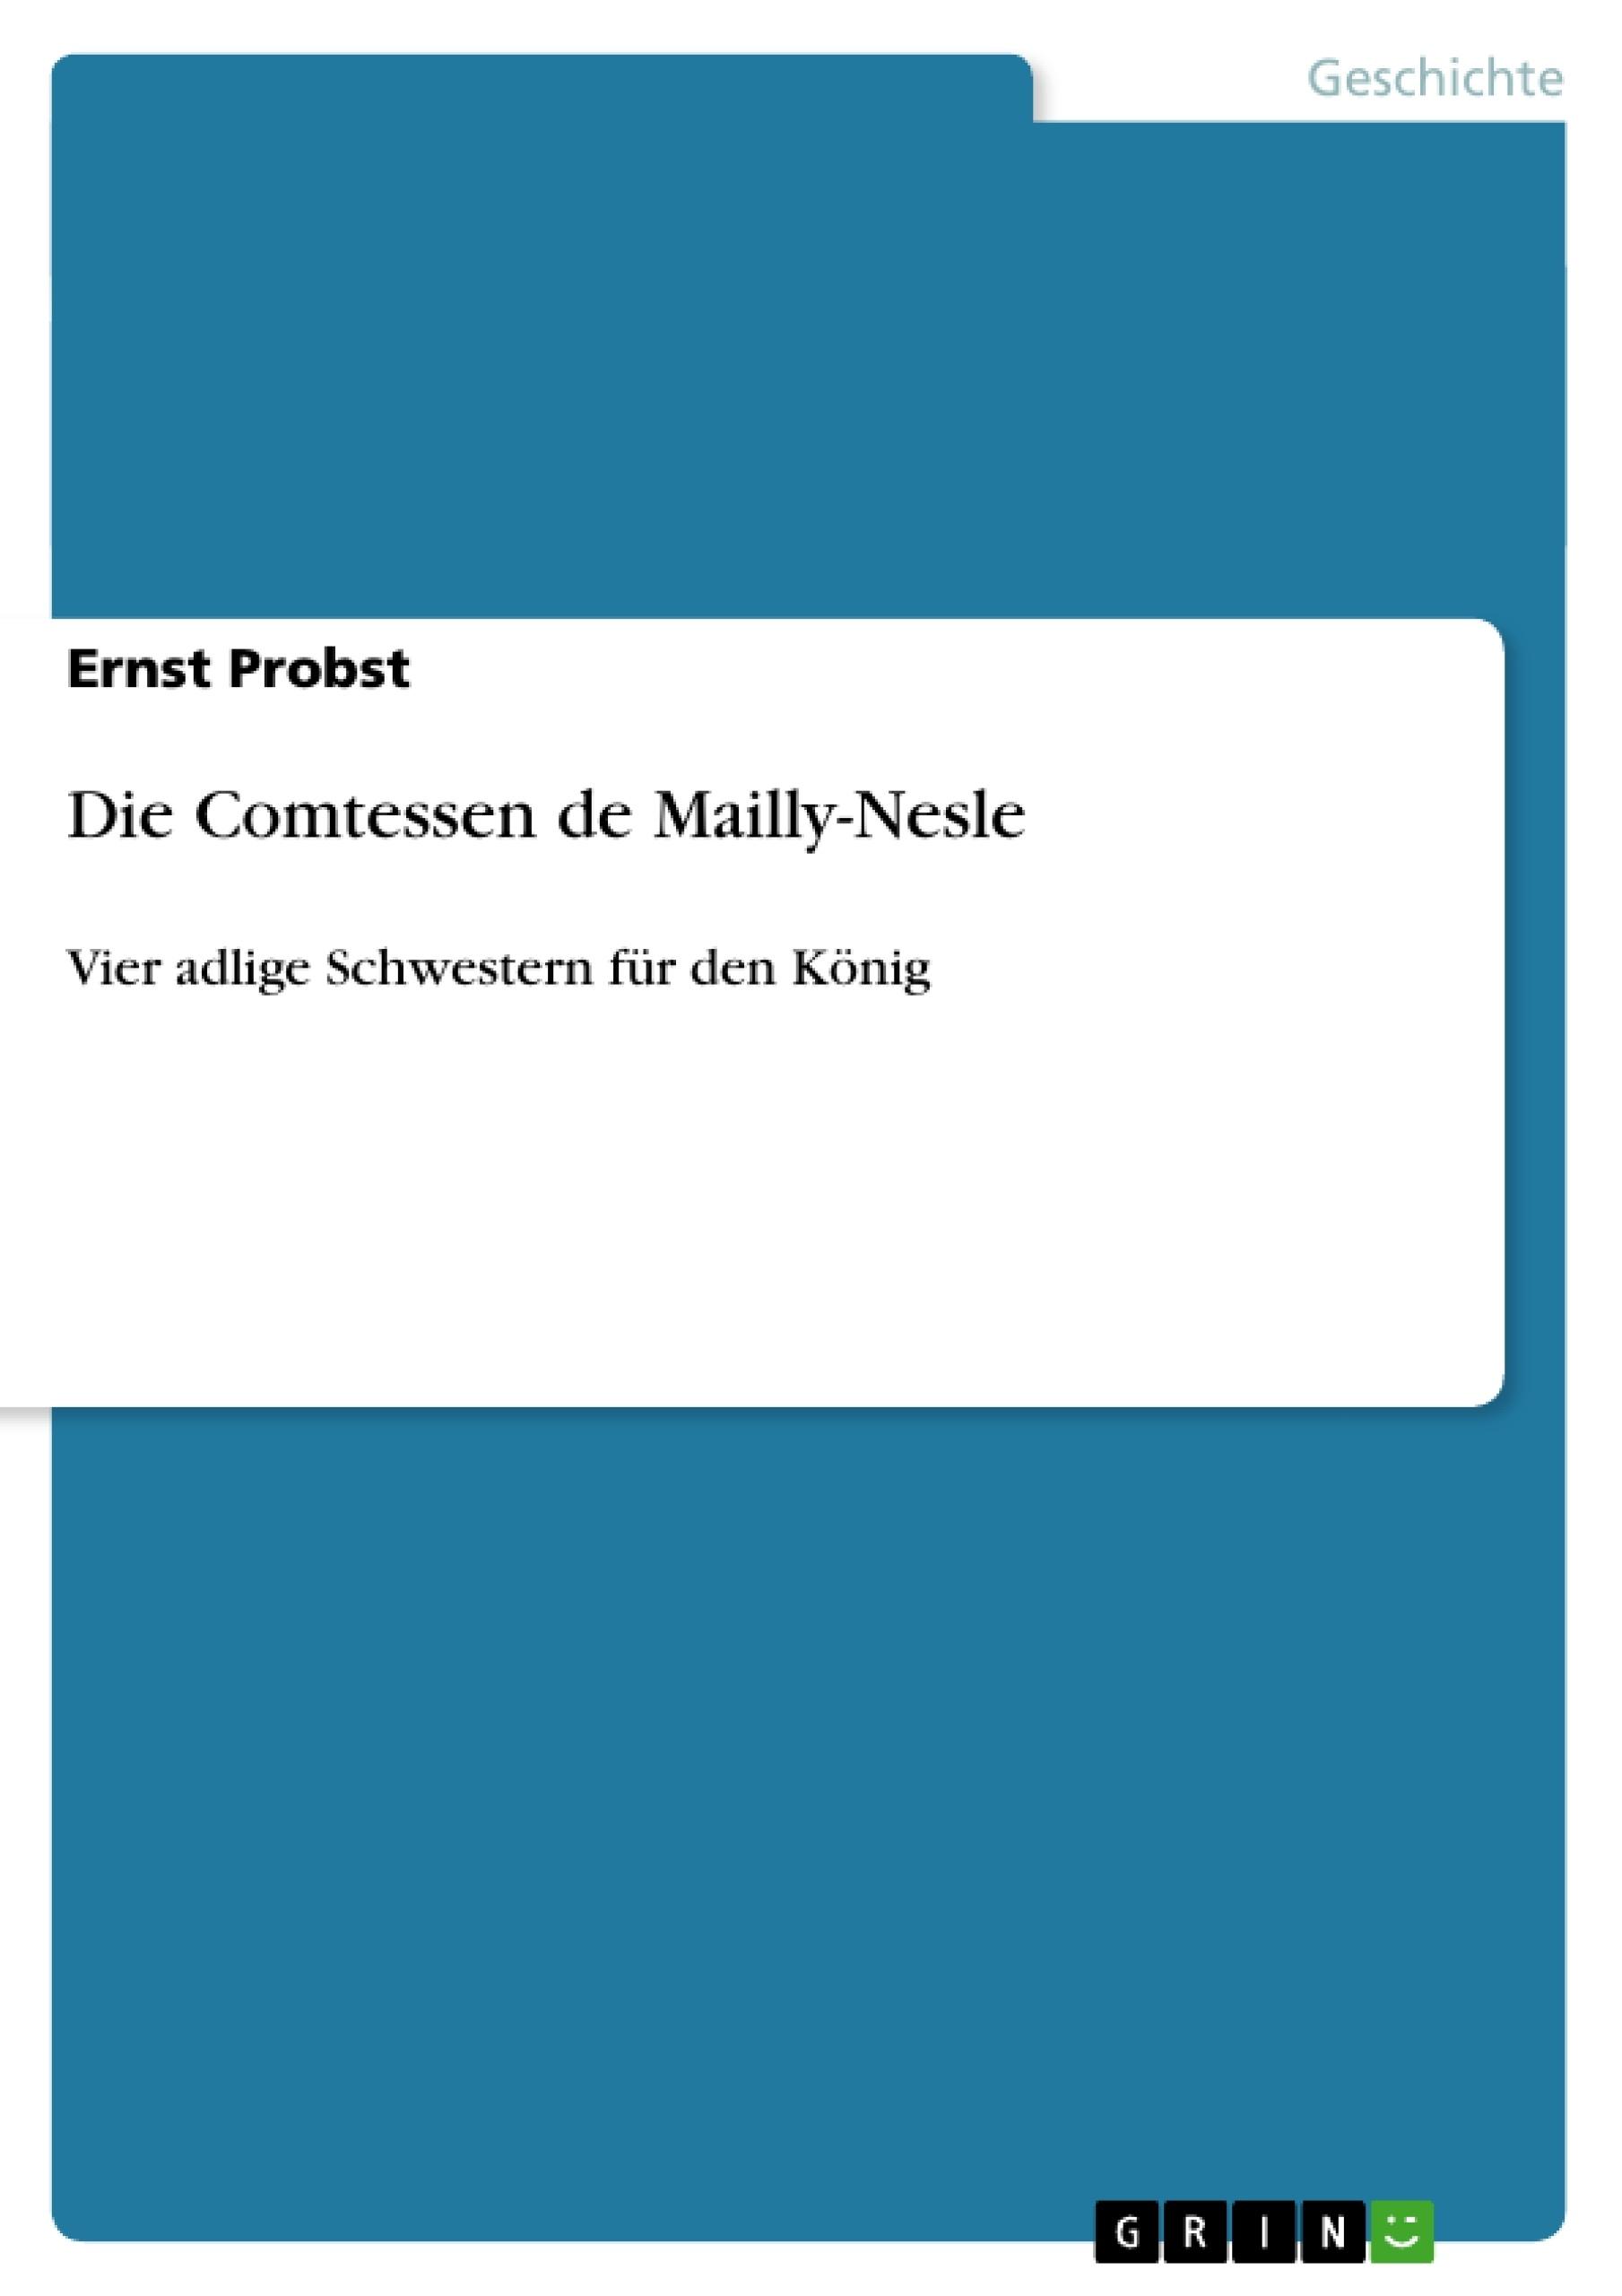 Titel: Die Comtessen de Mailly-Nesle